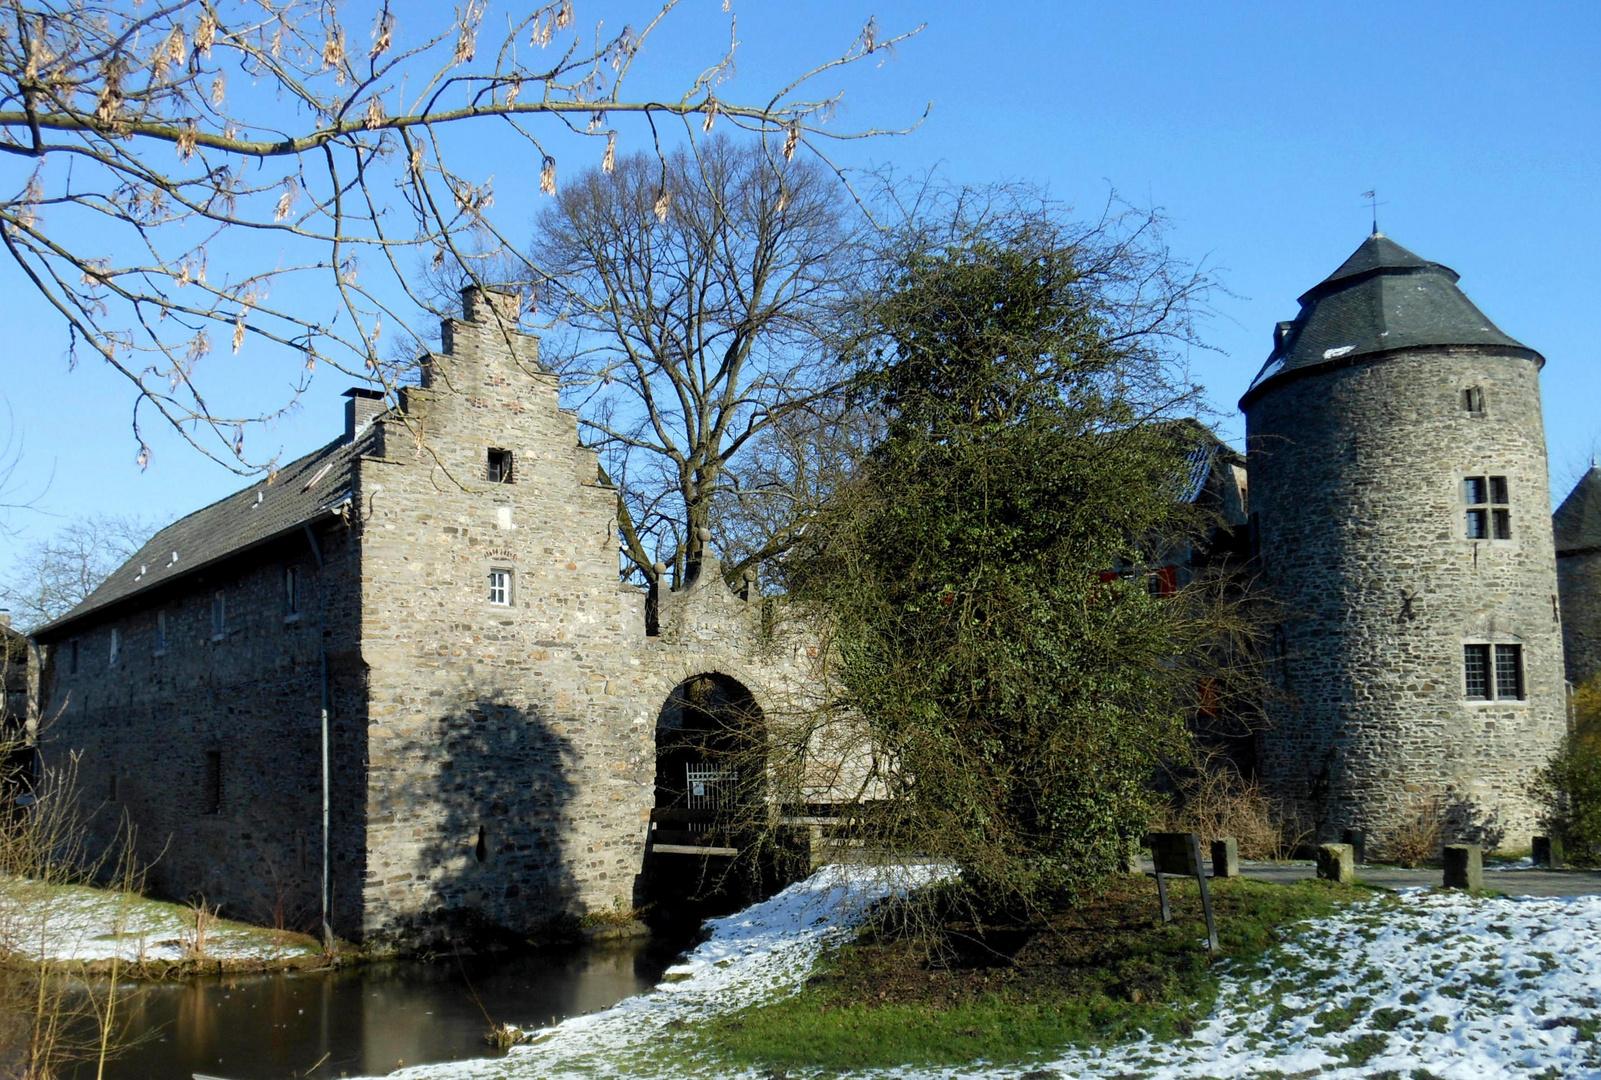 Schloss Angermund/Ratingen